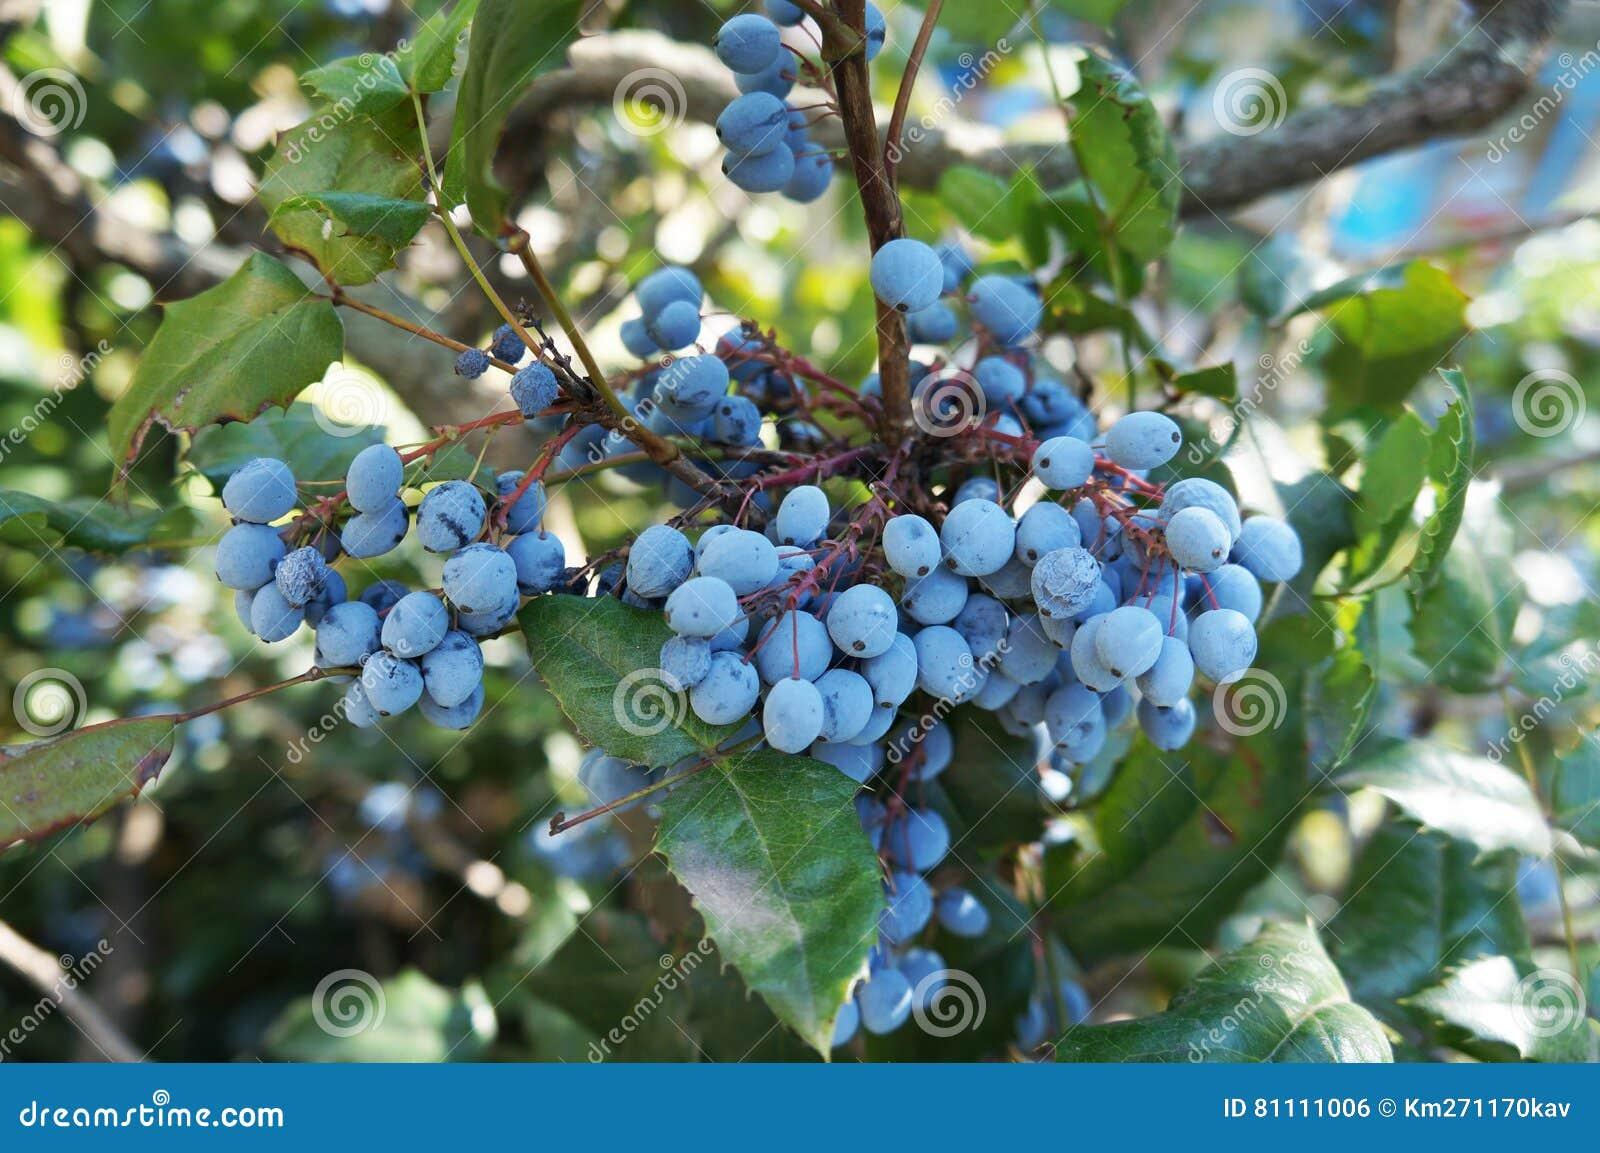 mahonia aquifolium blue fruits and green leaves stock photo image